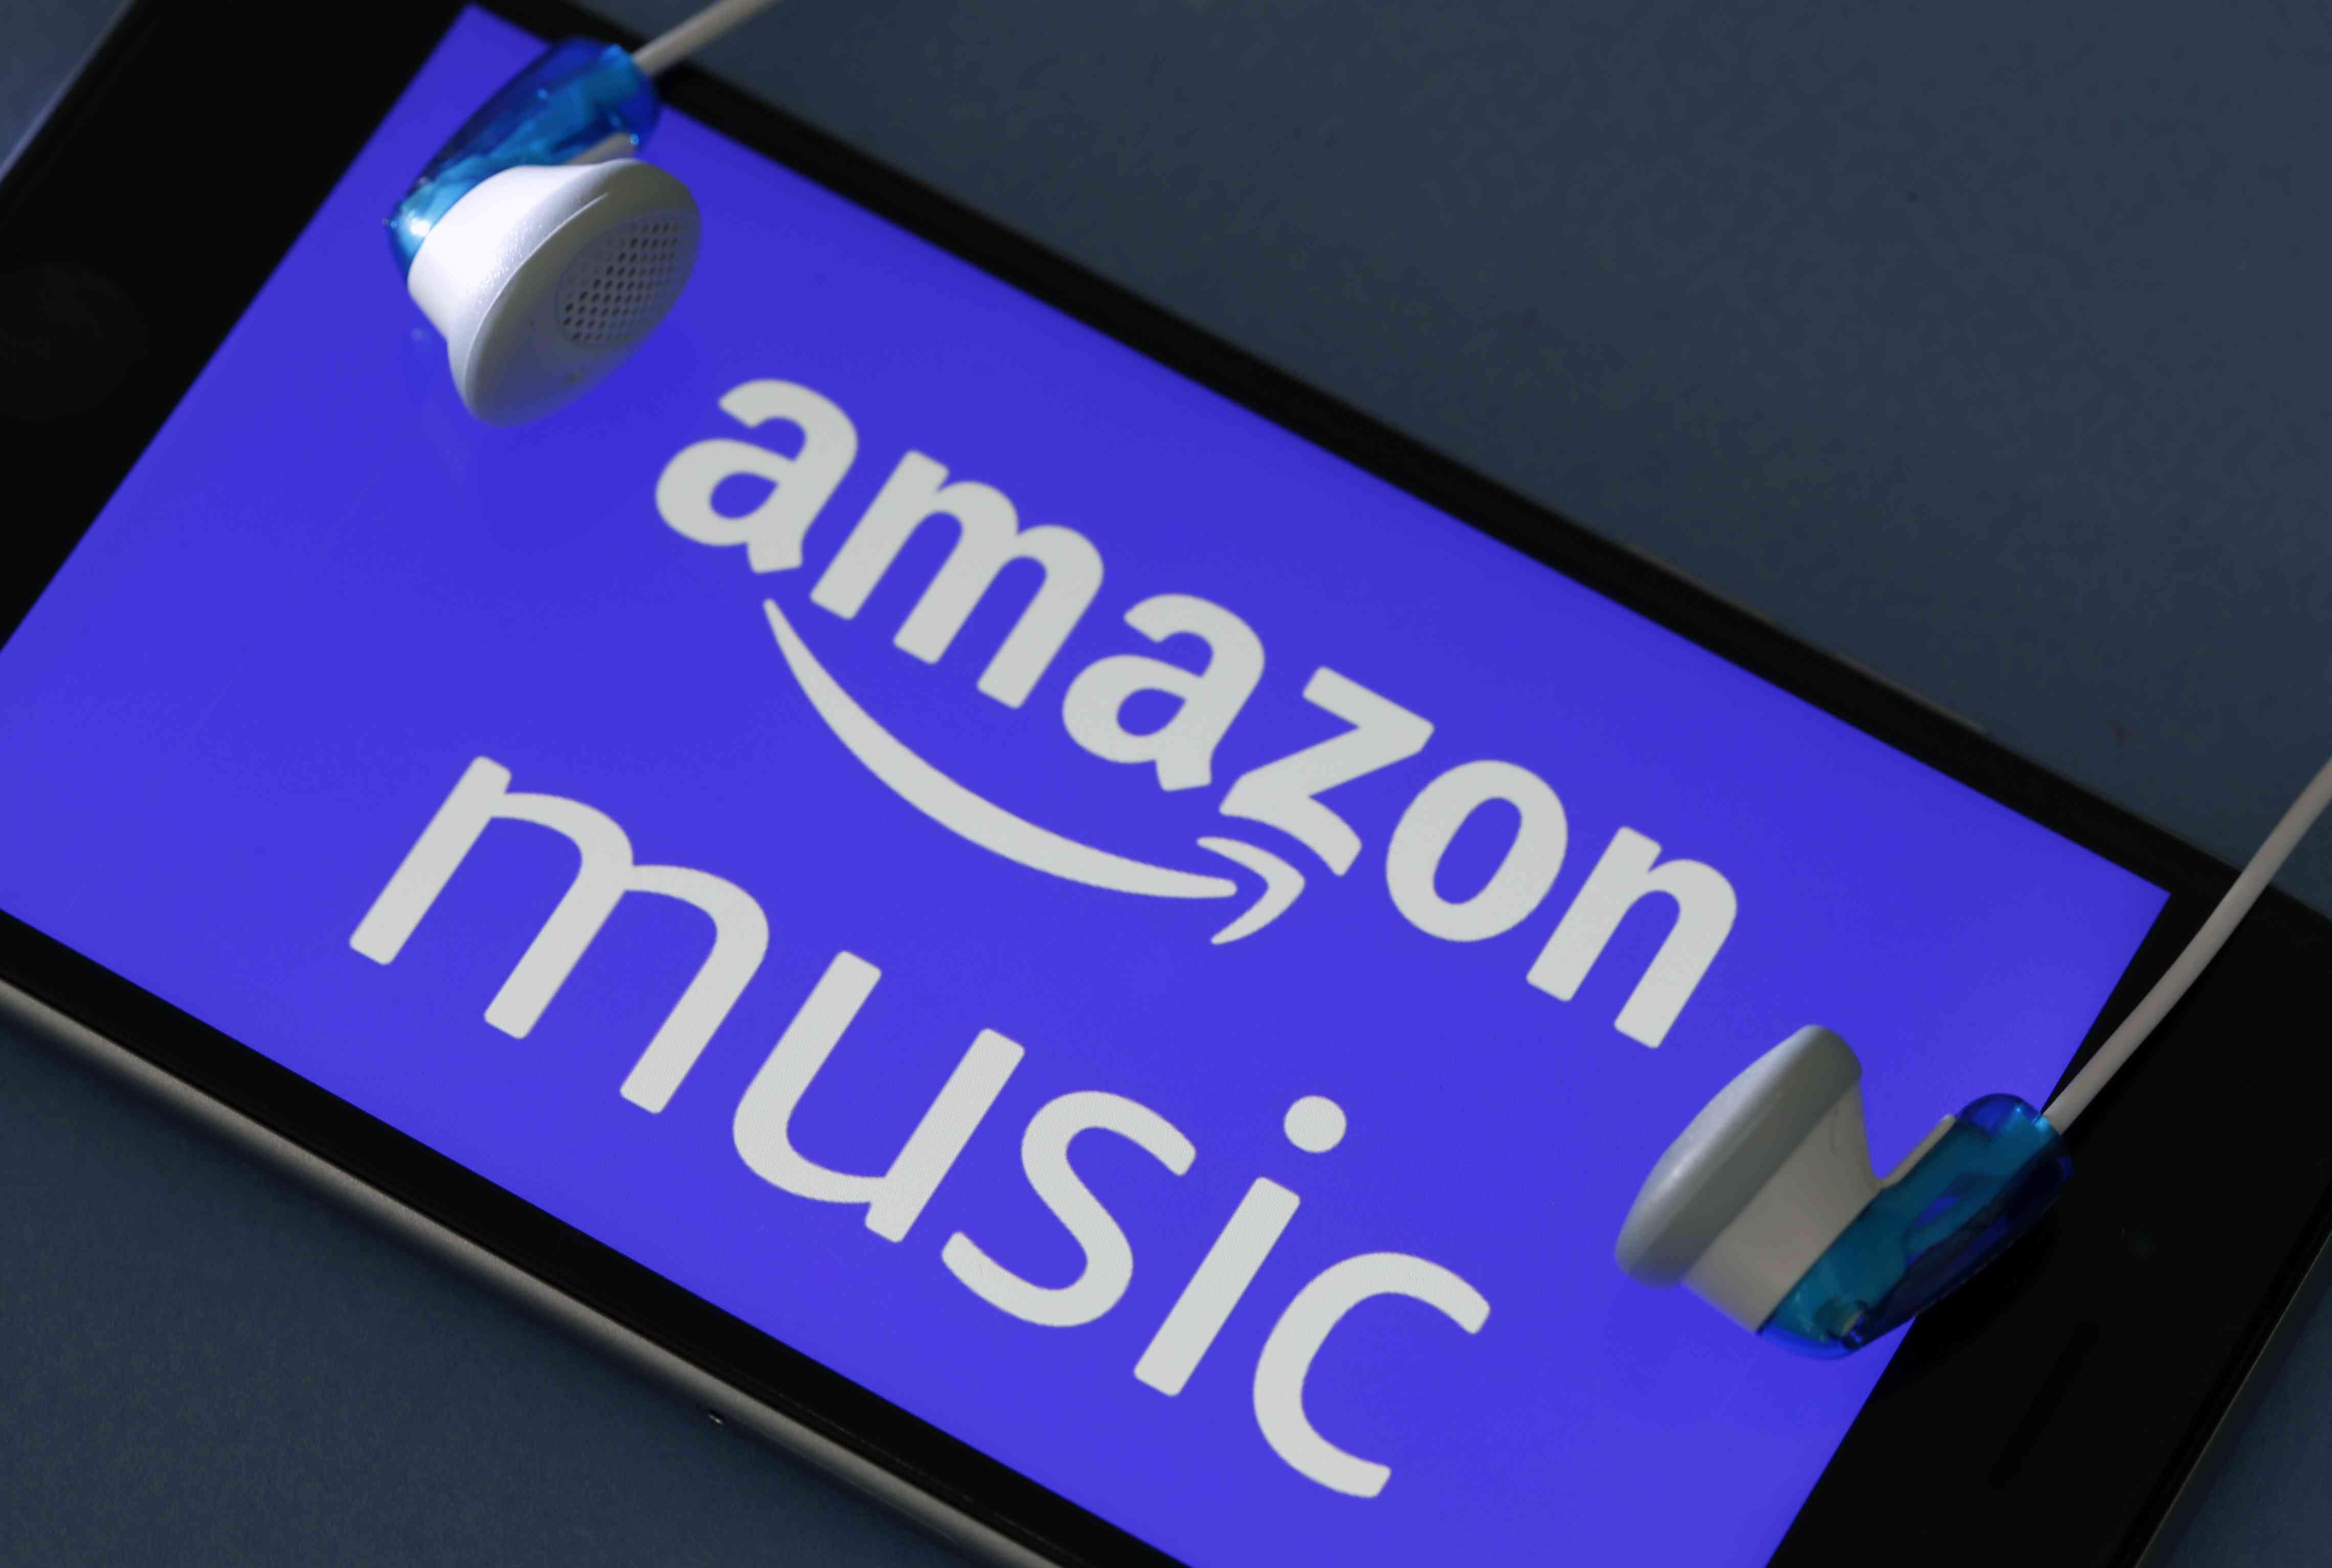 Headphones around smartphone displaying Amazon Music music download service logo